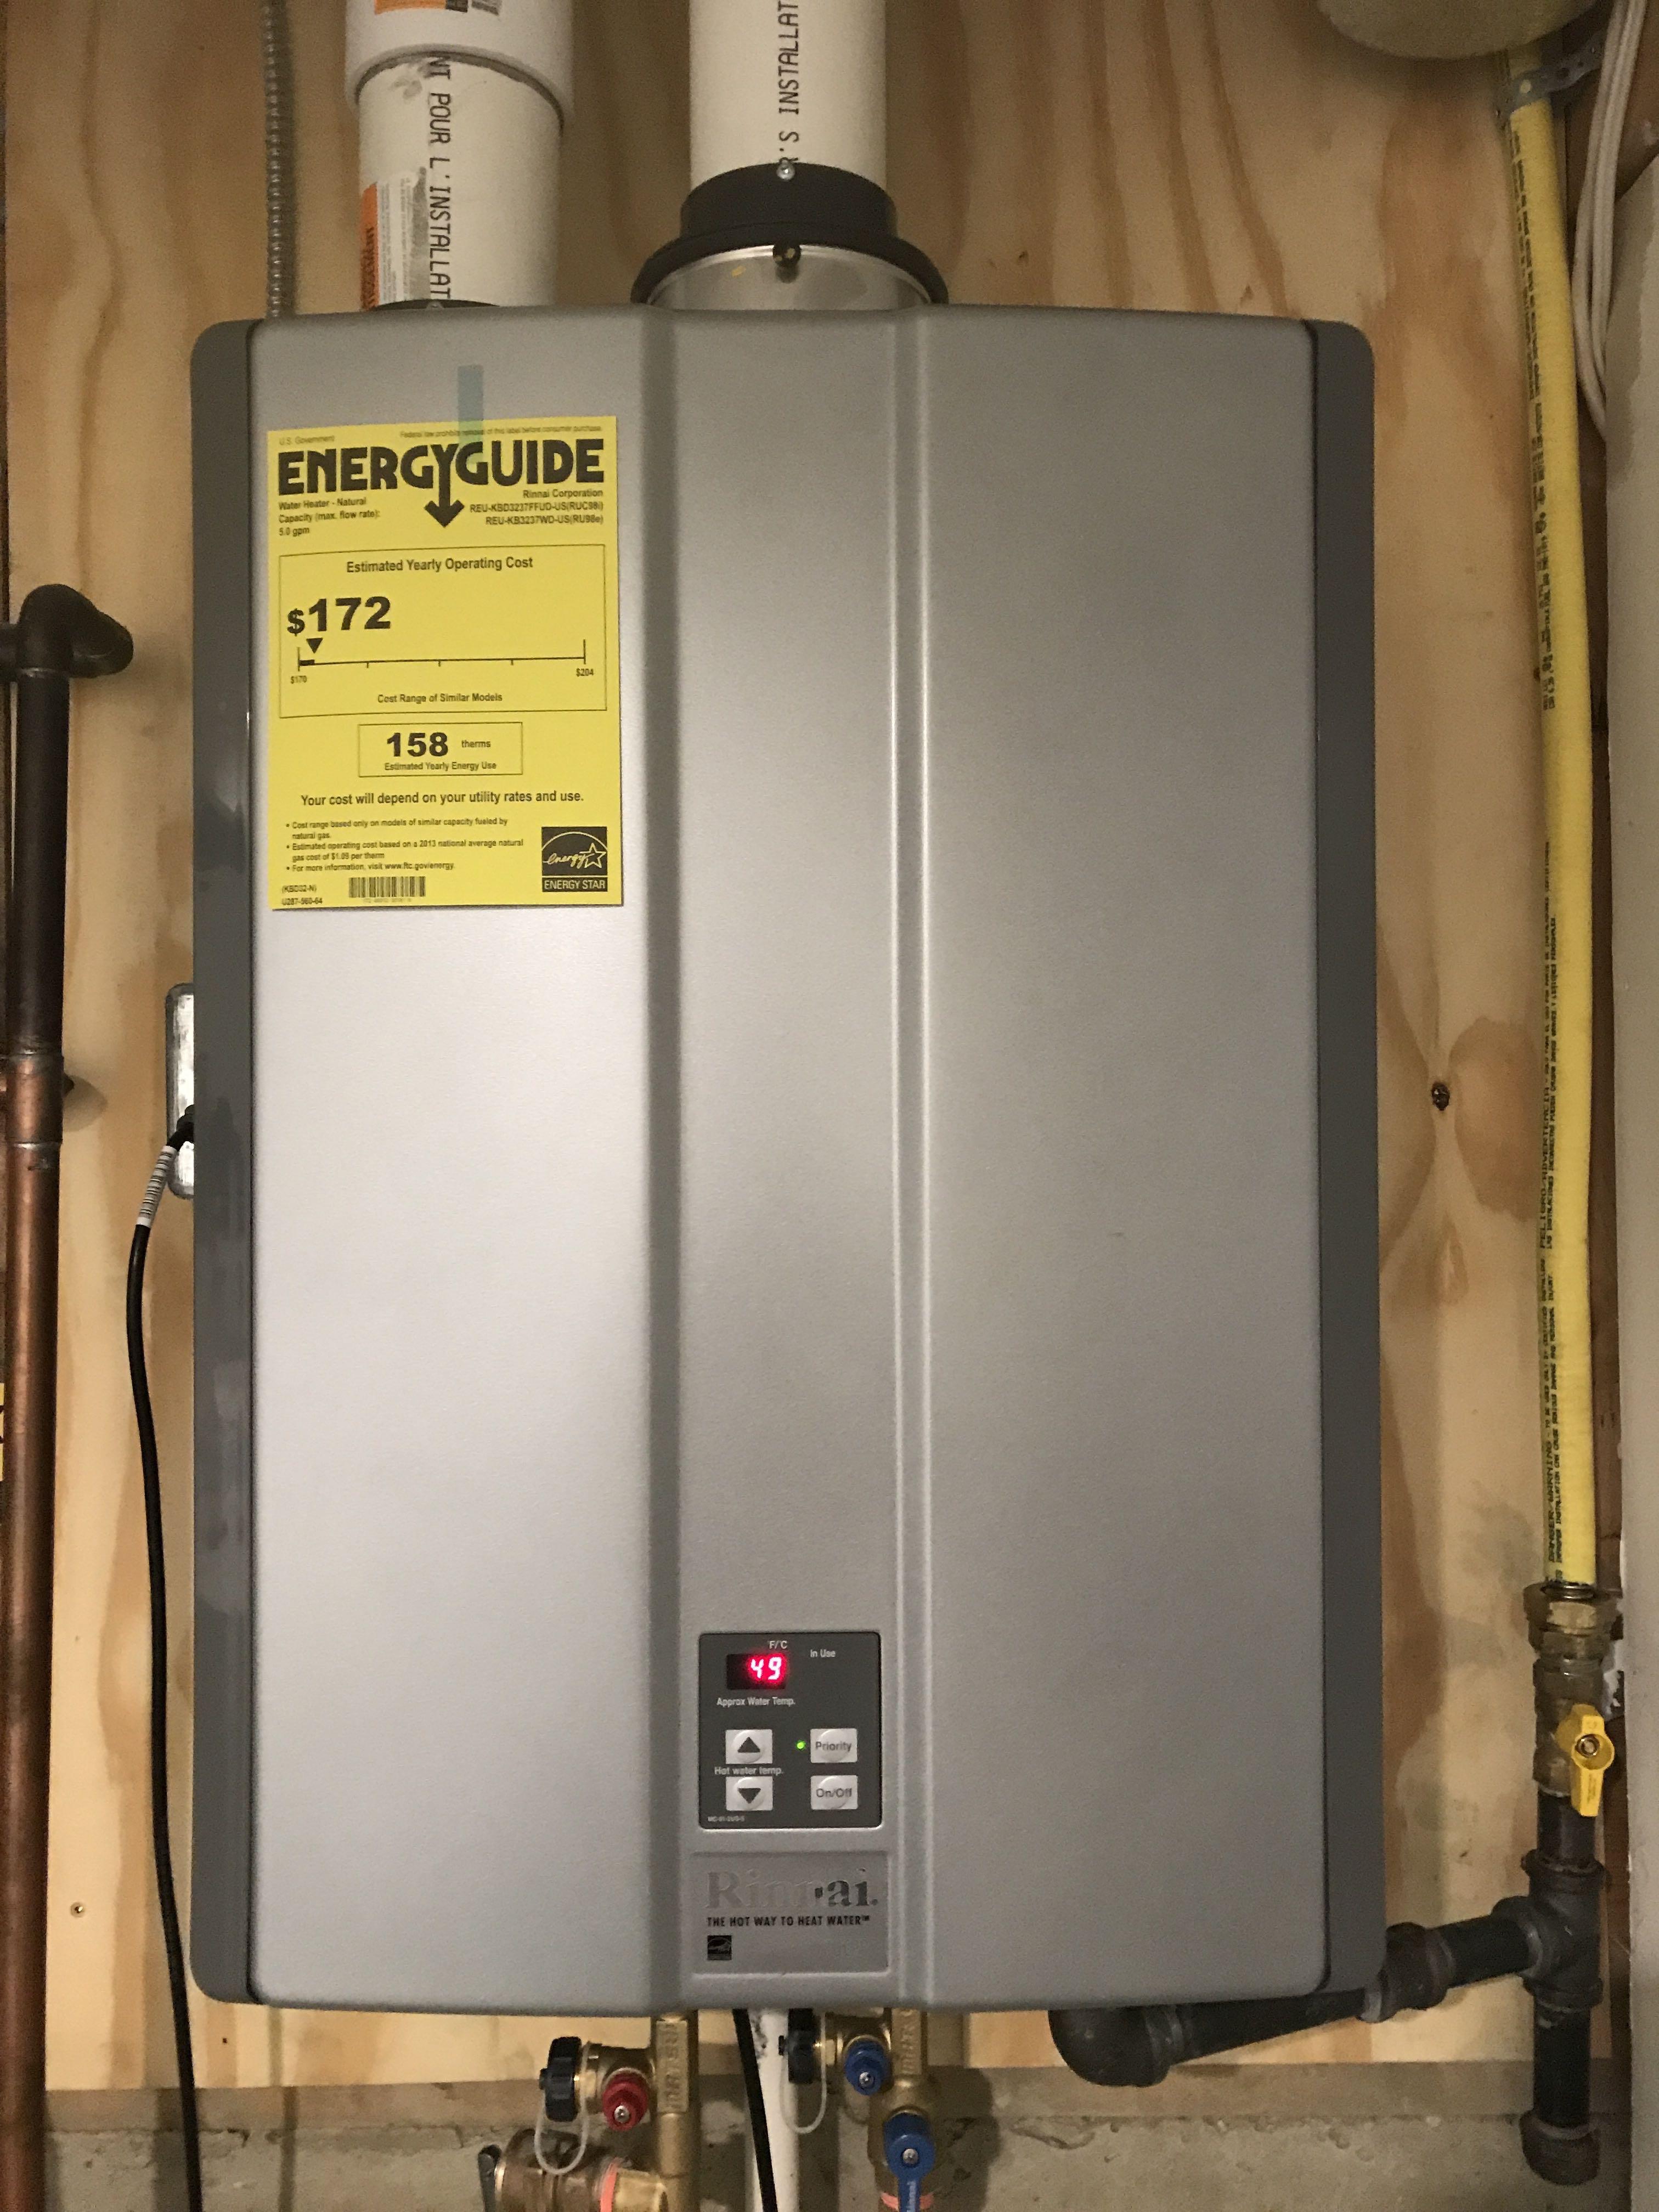 water heater danfoss vlt 2800 wiring diagram 177 heaters 101 getting yourself in hot